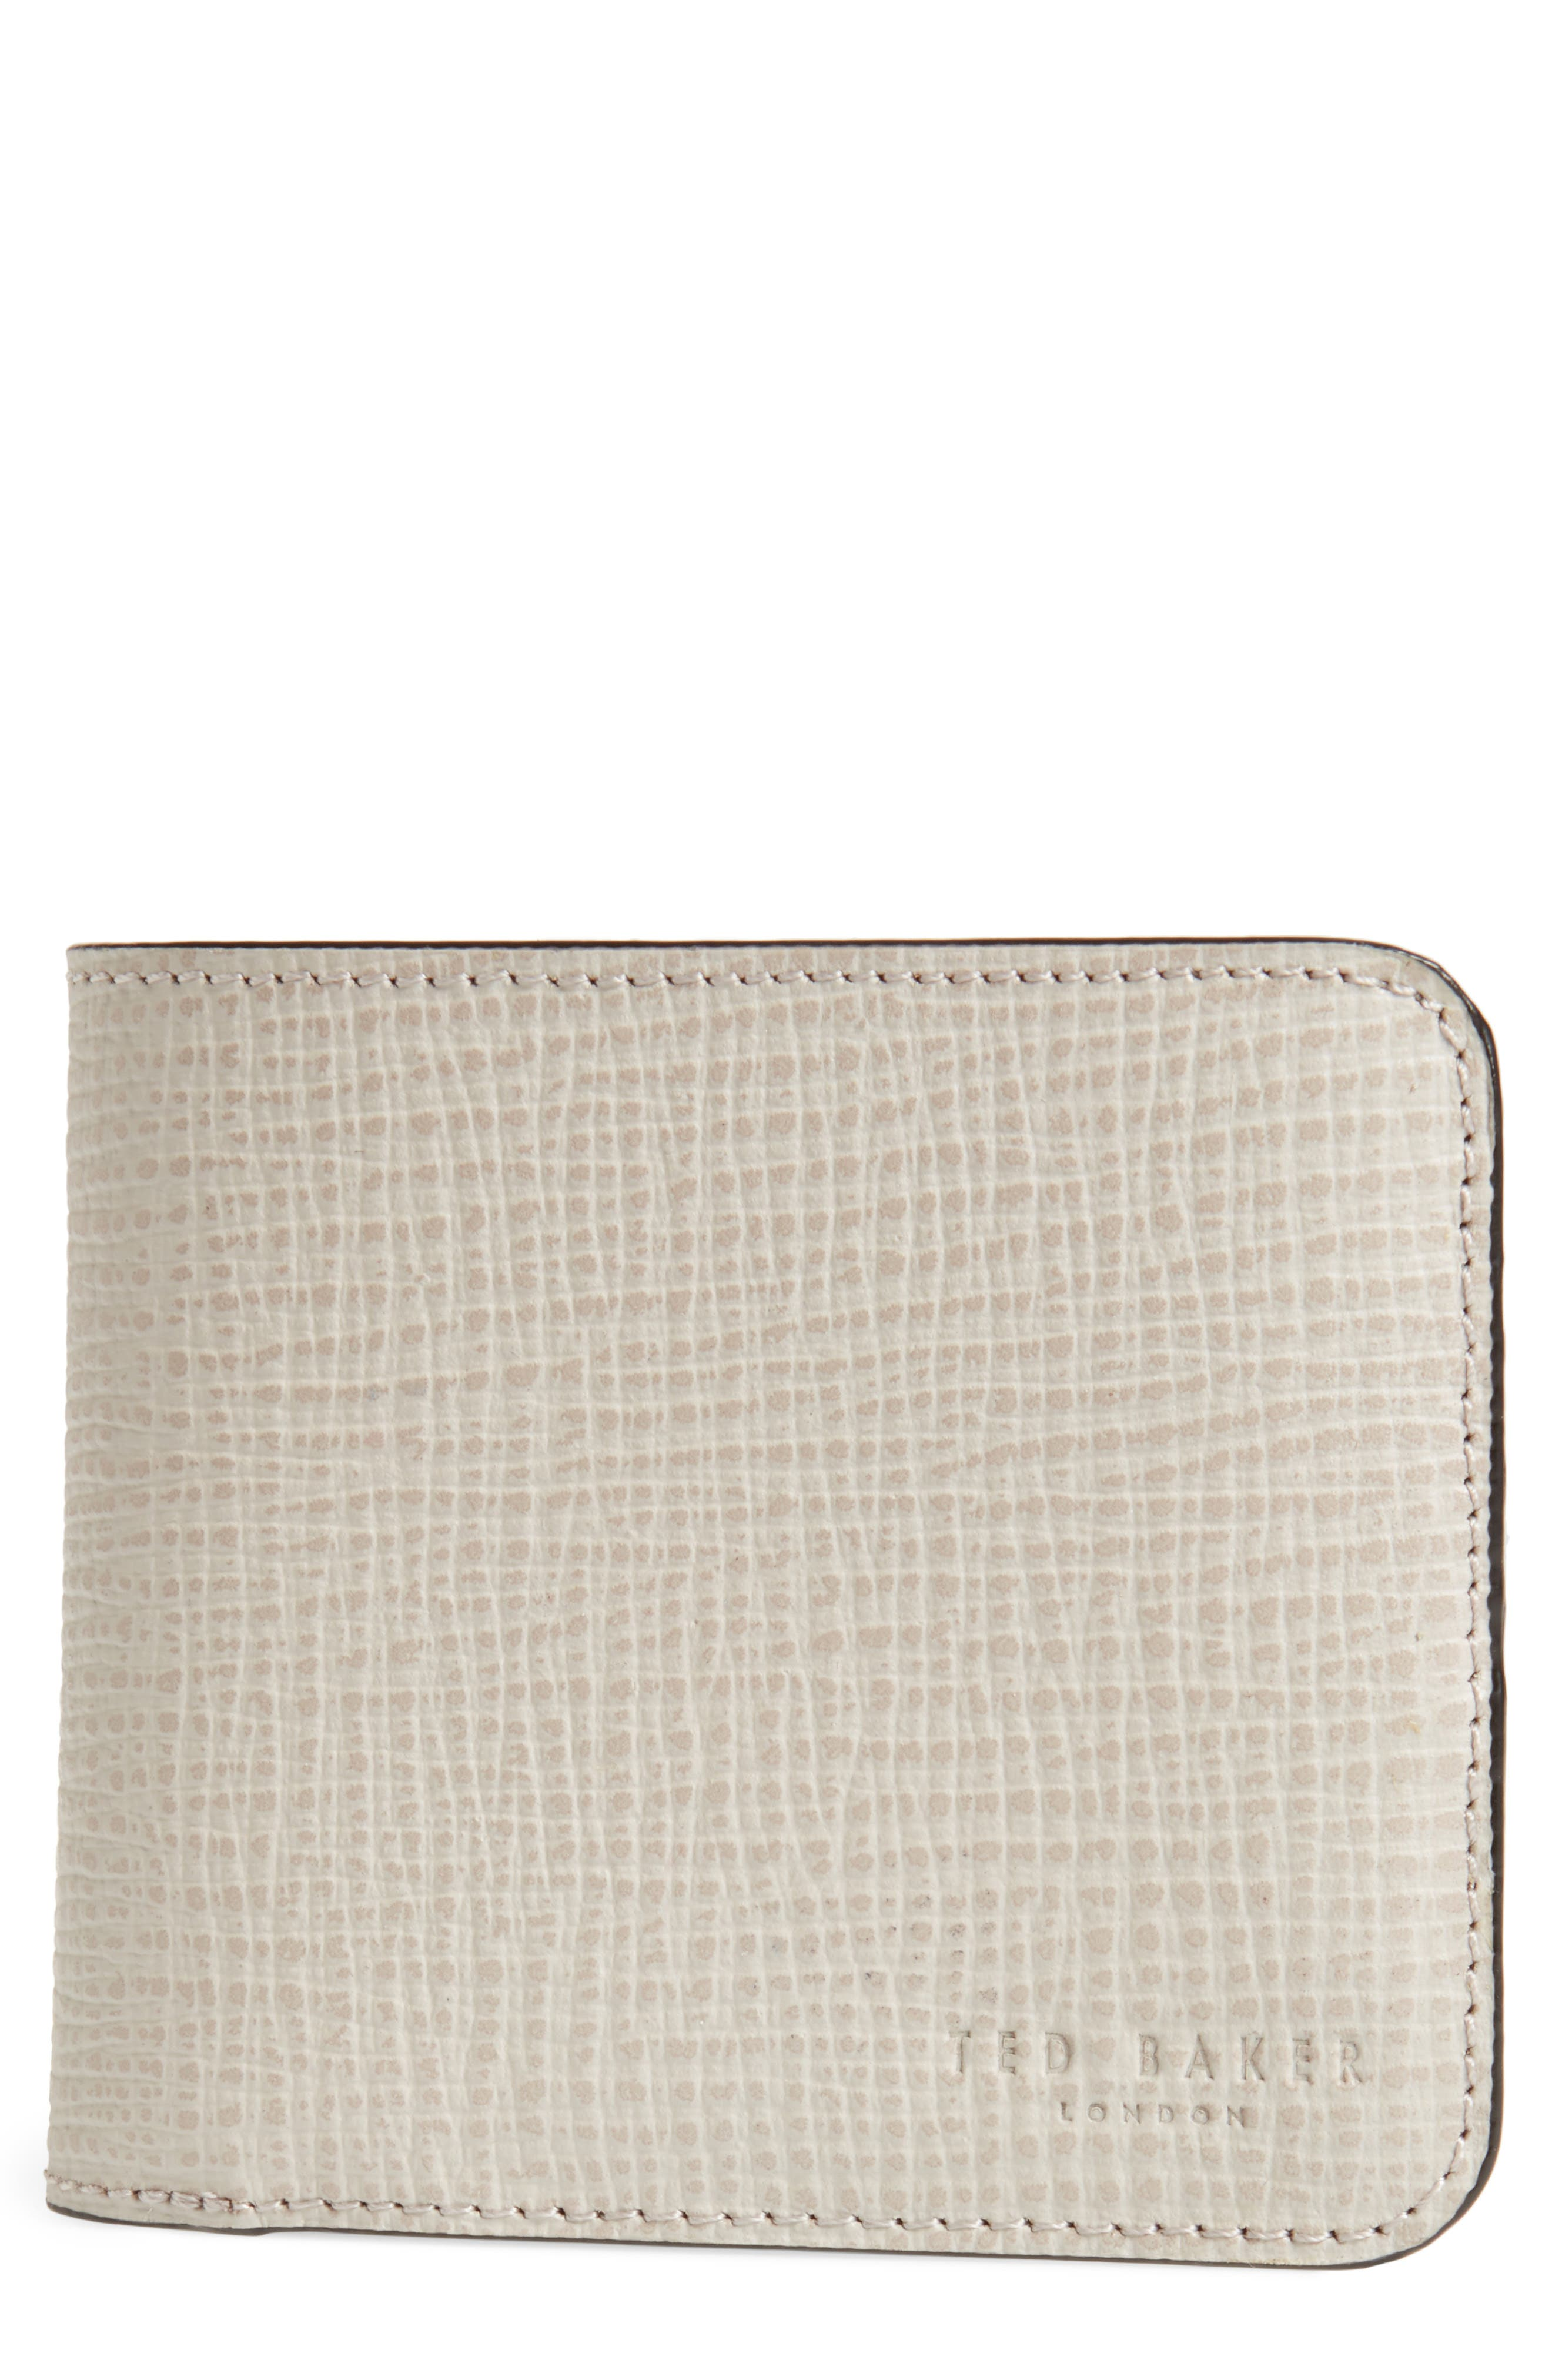 Astridd Palmelato Leather Wallet,                         Main,                         color, Natural